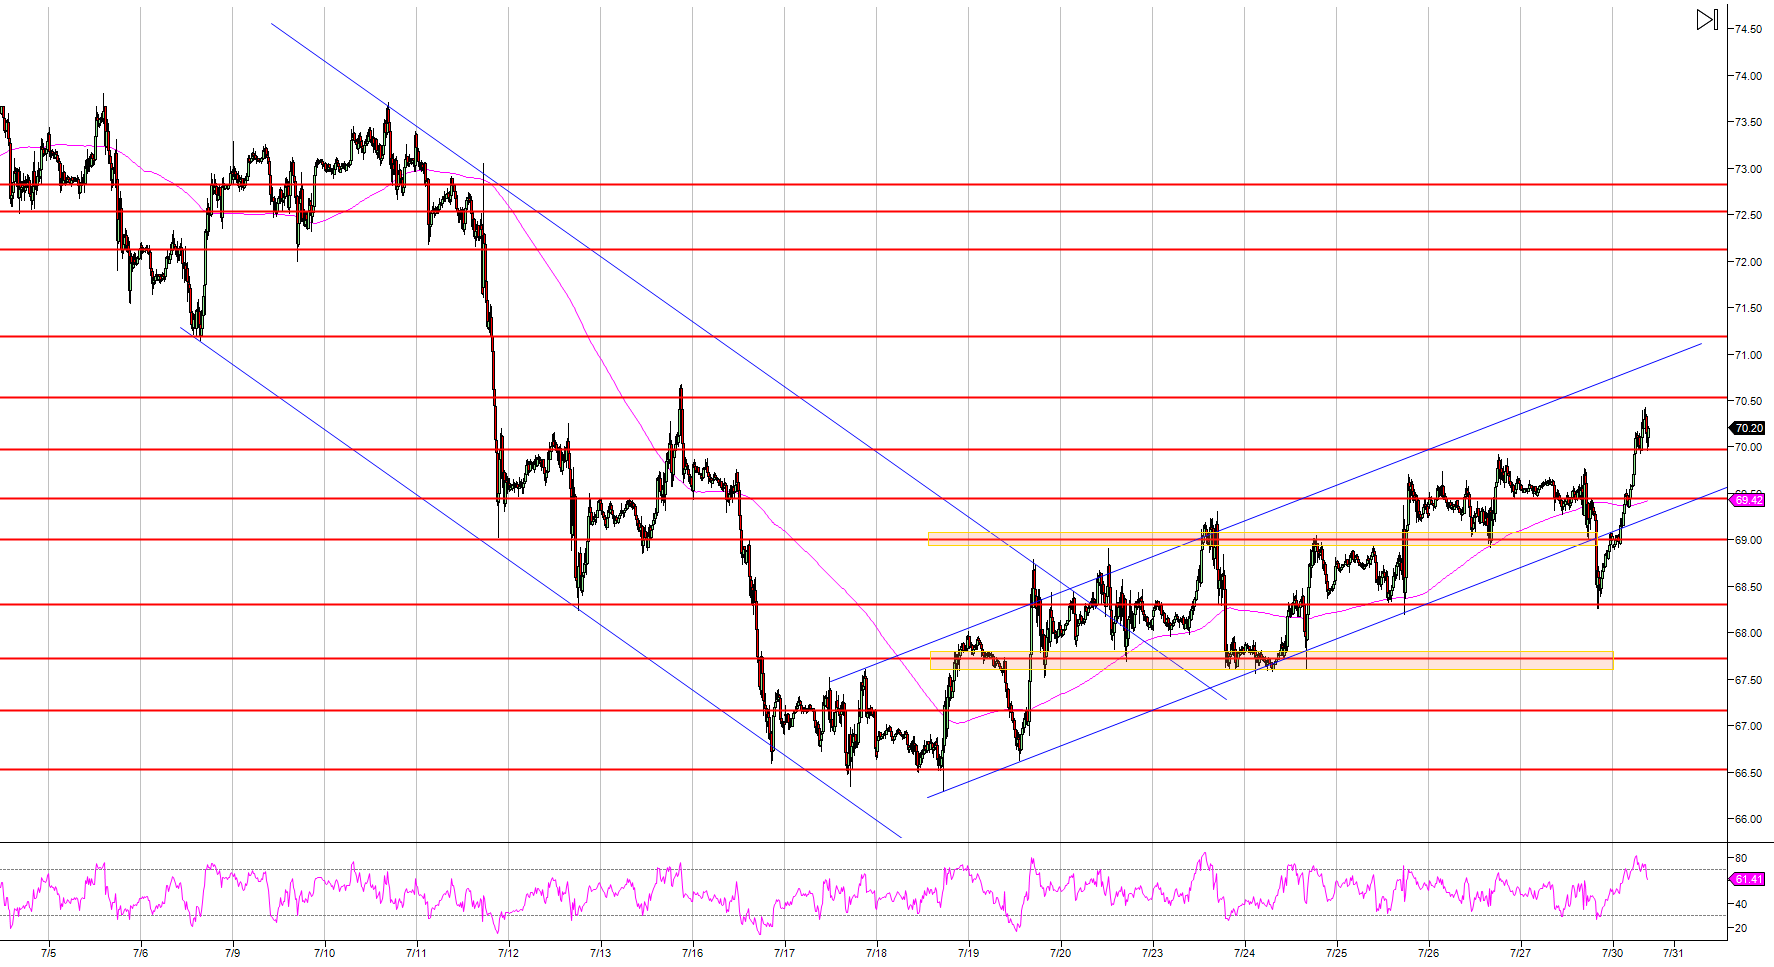 Crude Oil WTI Technical Analysis Bull Breakout Above 7000 A Barrel